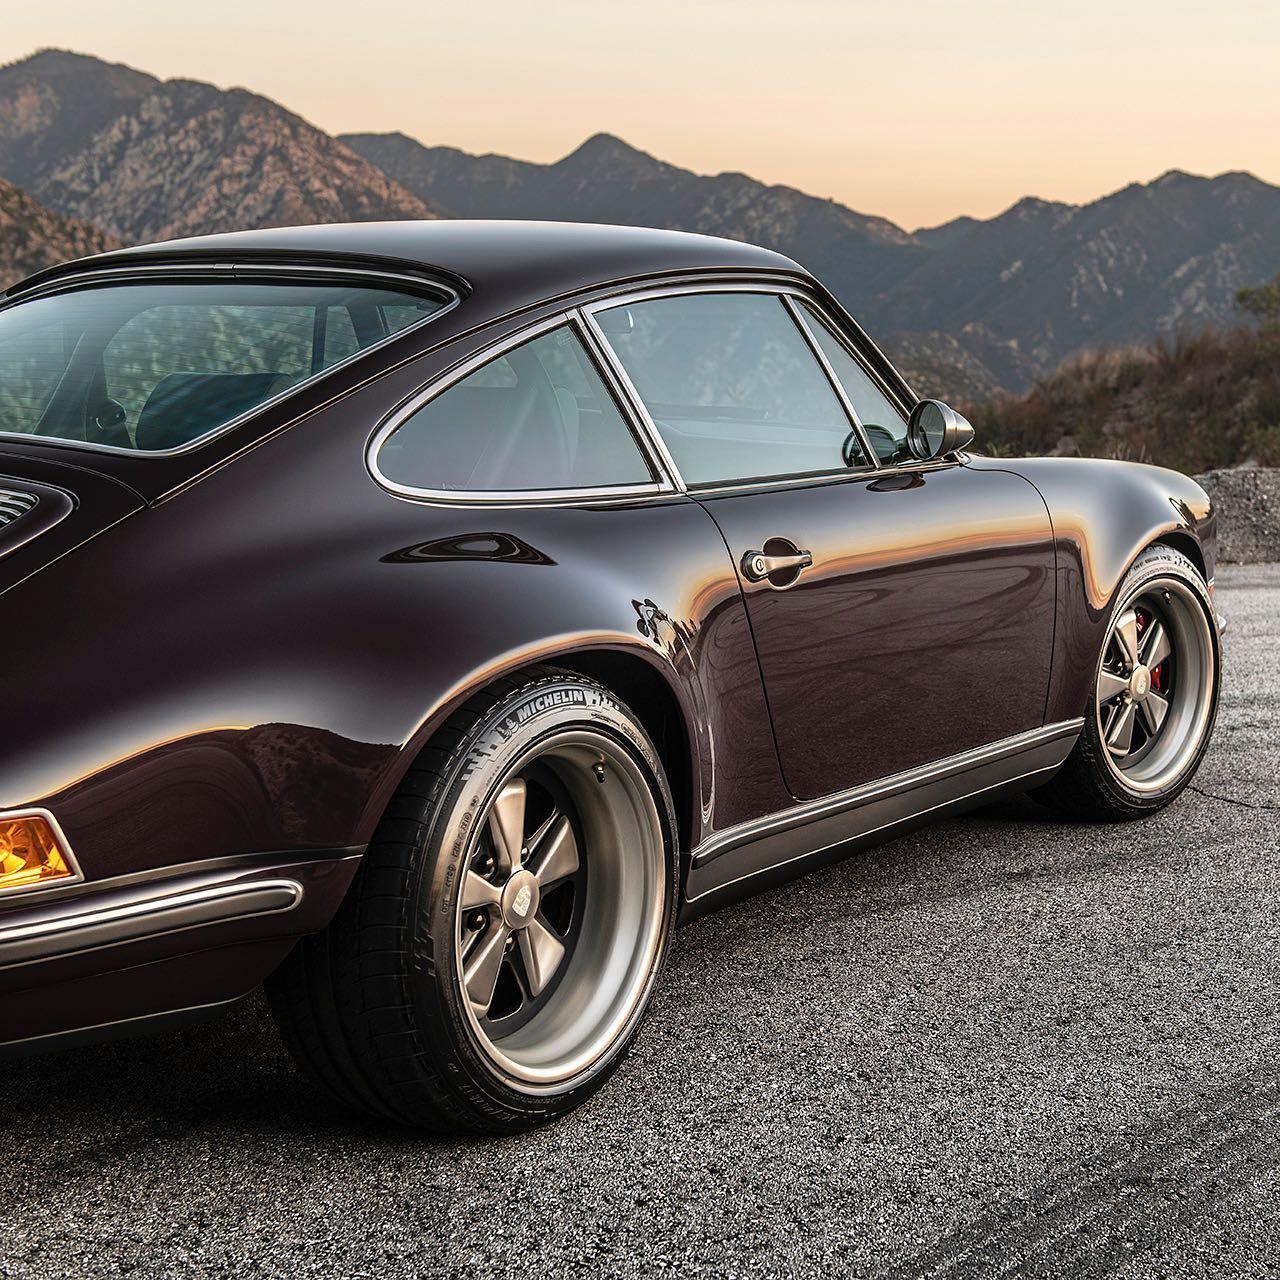 Singer_Anglet_Commission_Porsche_911_0002